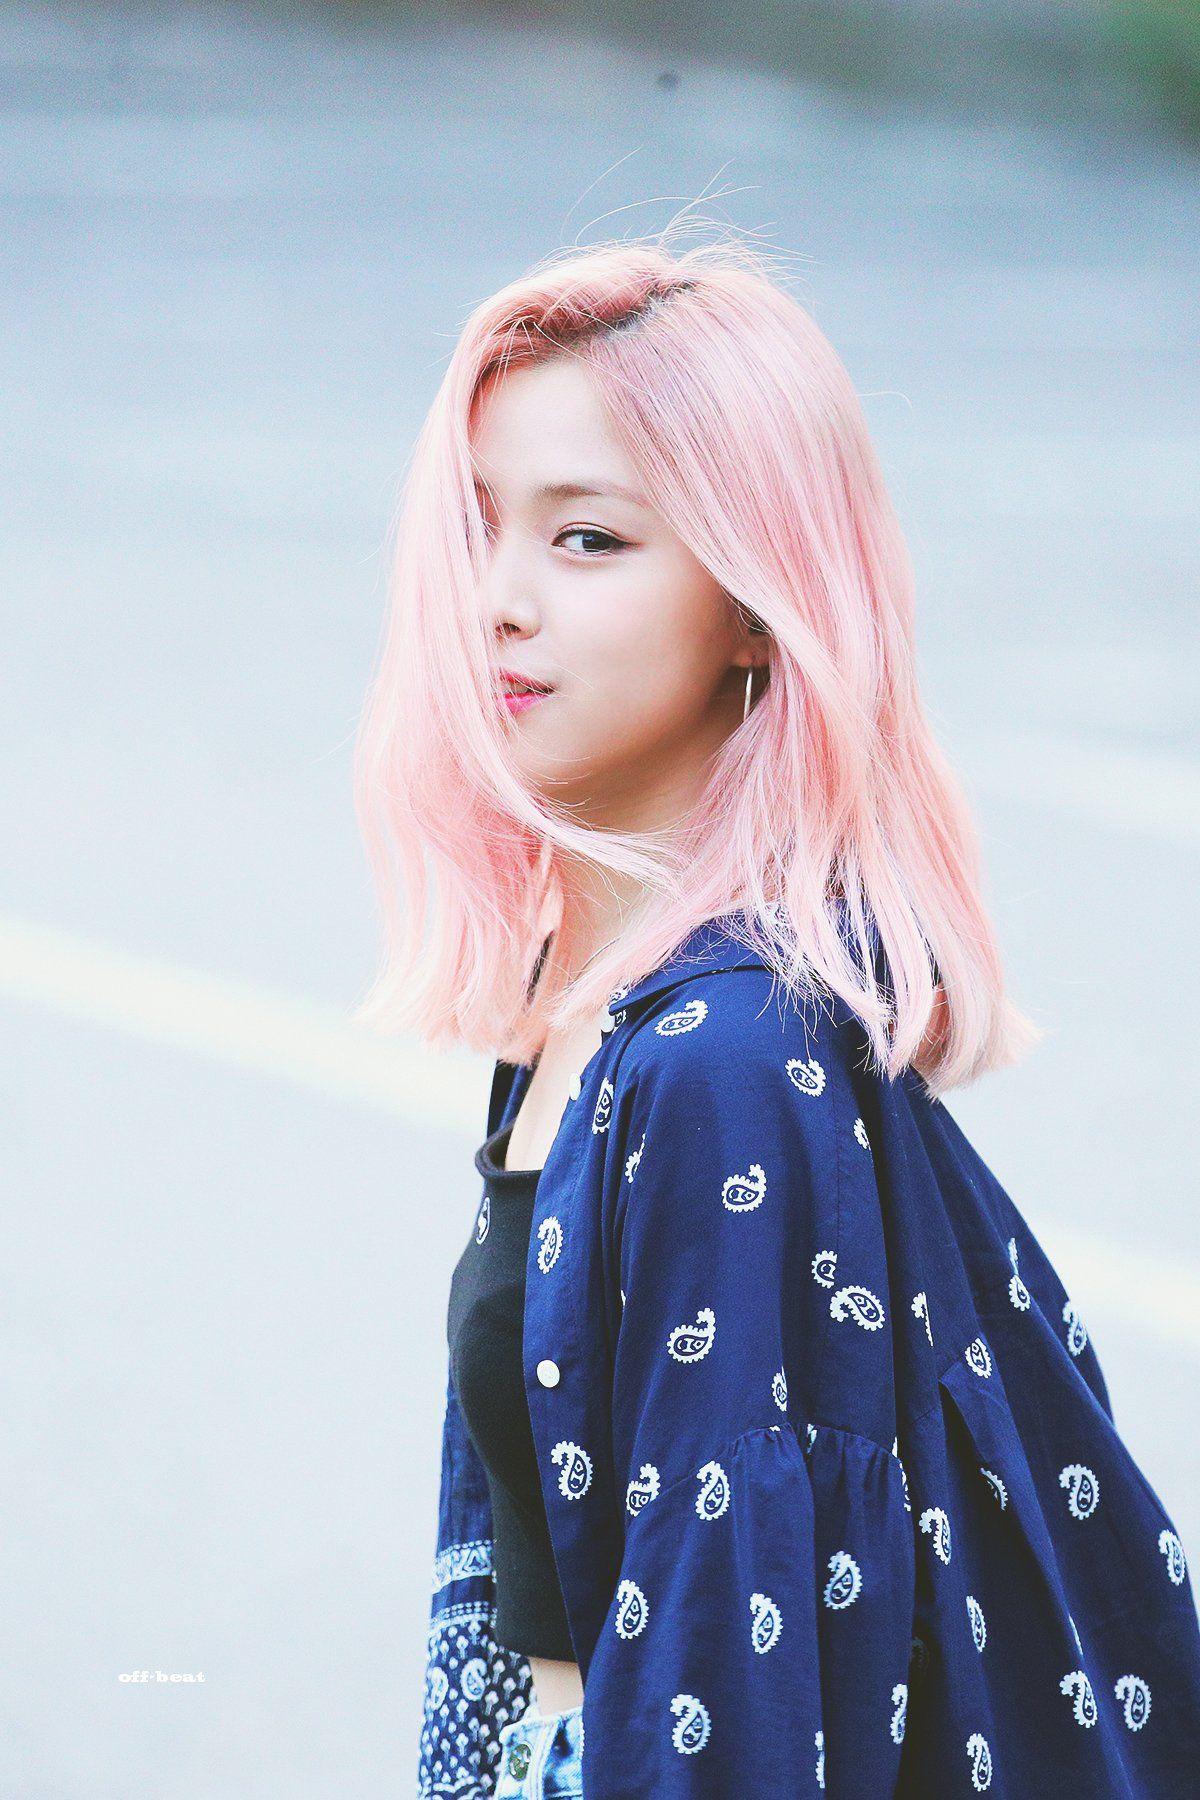 Ryujin Pics On Twitter Itzy Pink Hair Girl